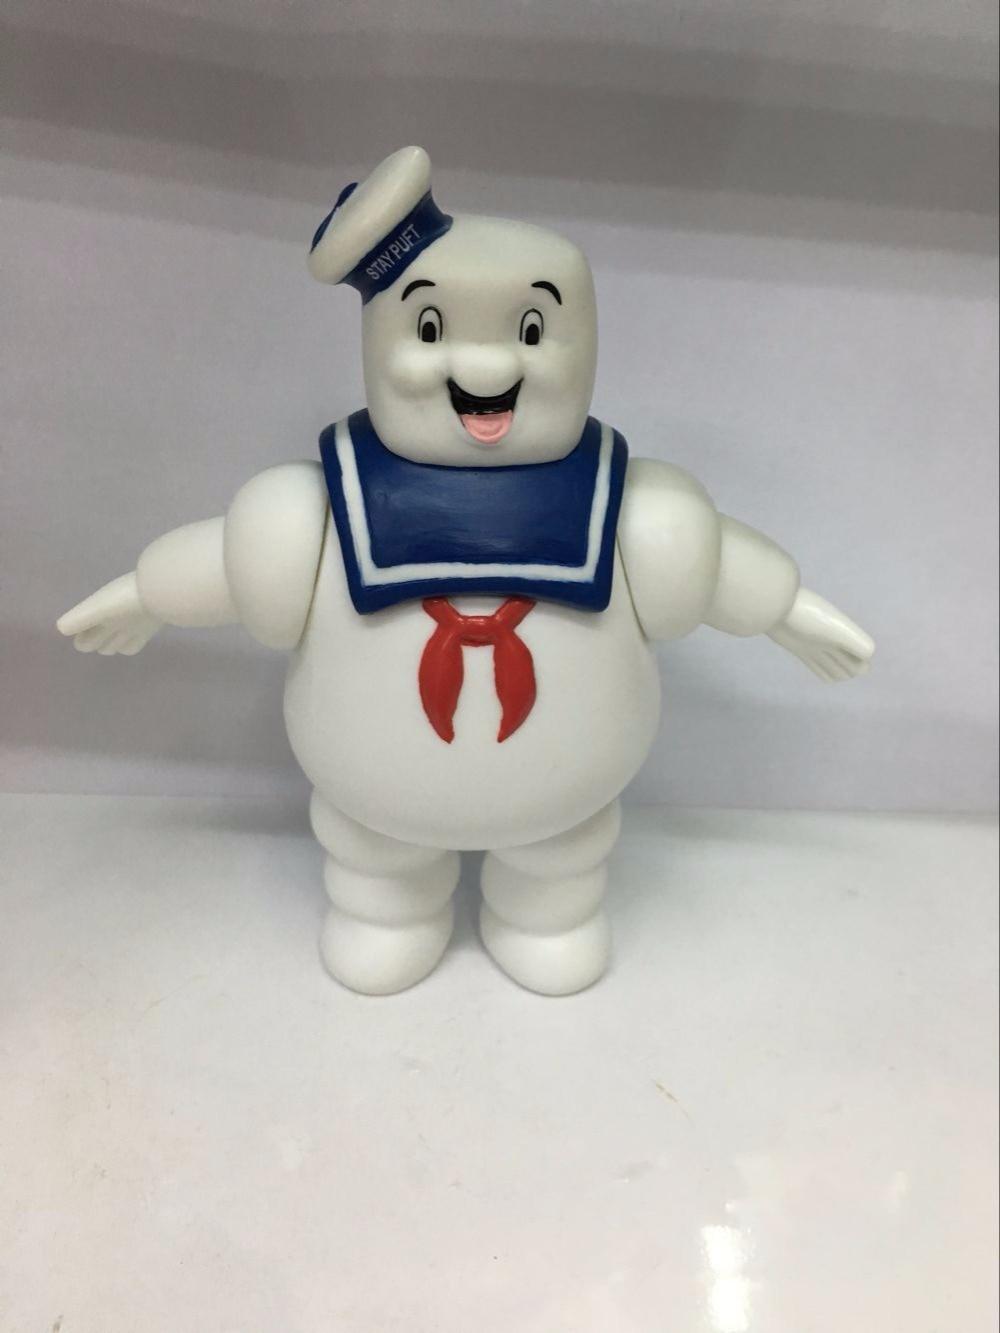 2 pcs set Vintage Ghostbusters 3 Tetap Puft Marshmallow Man Slimer Sailor  Action Figure Mainan Boneka Dekorasi Rumah di Aksi   Toy Angka dari Mainan    Hobi ... 36173cb980